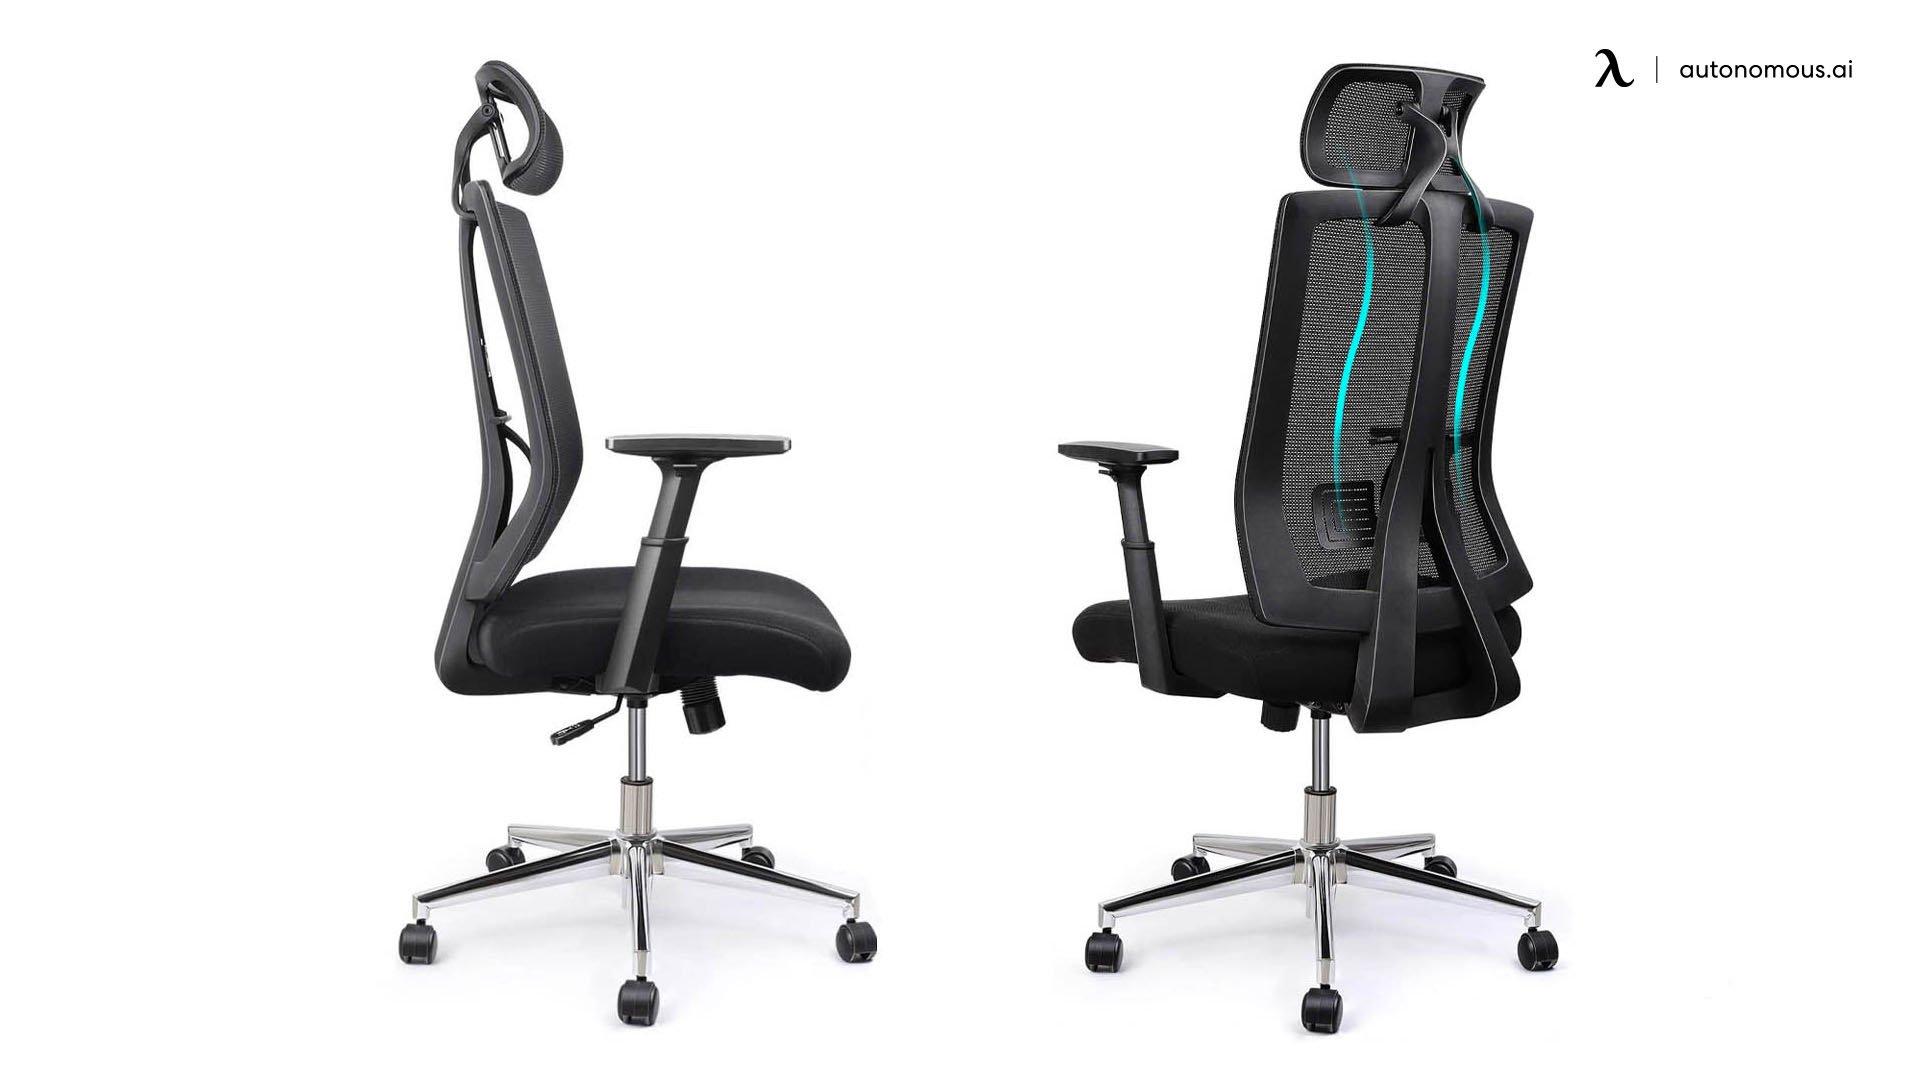 Ergonomic Office Chair - INTEY